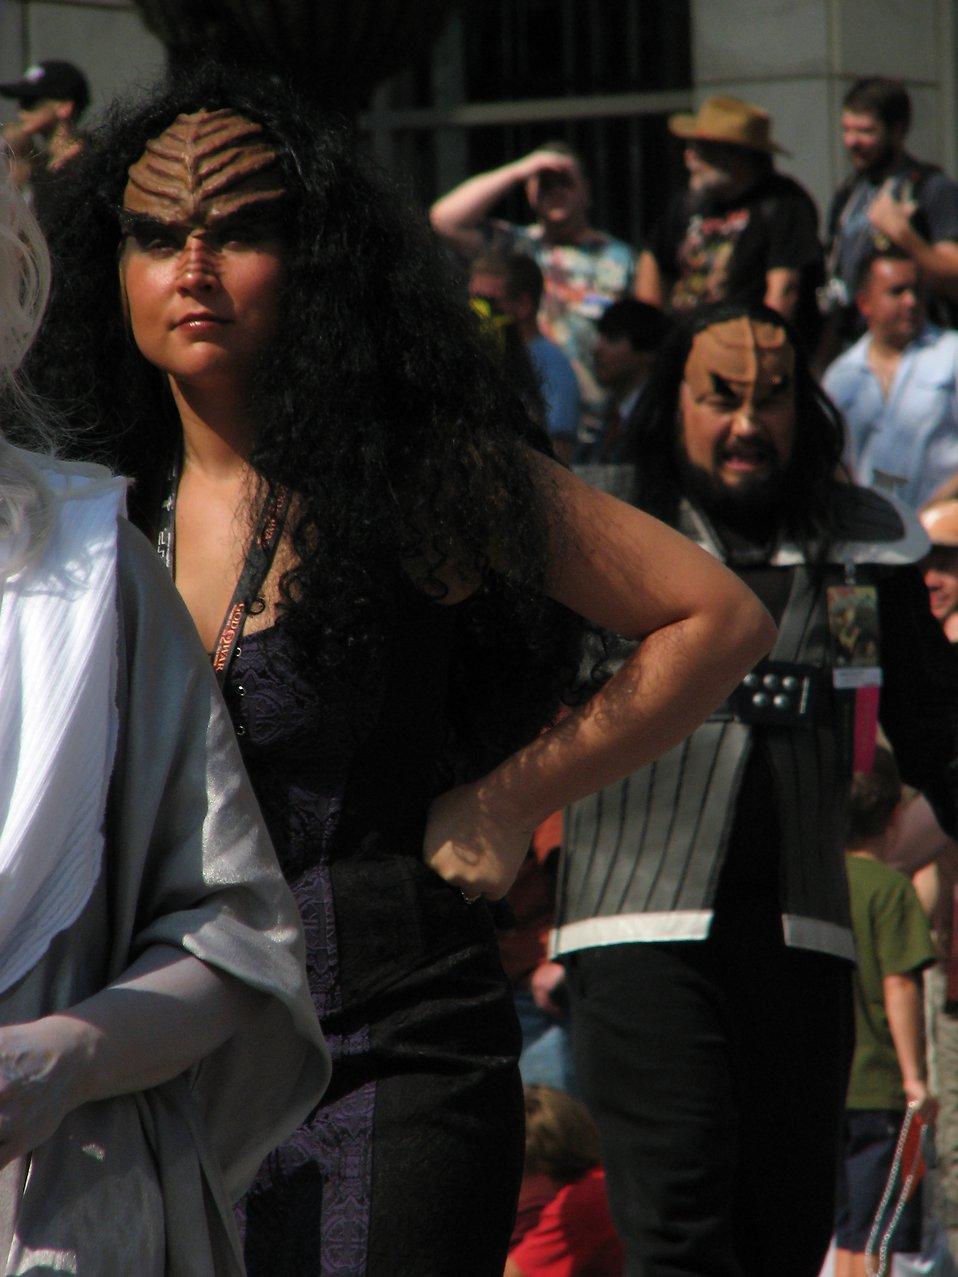 Klingon woman in the 2008 Dragoncon parade : Free Stock Photo